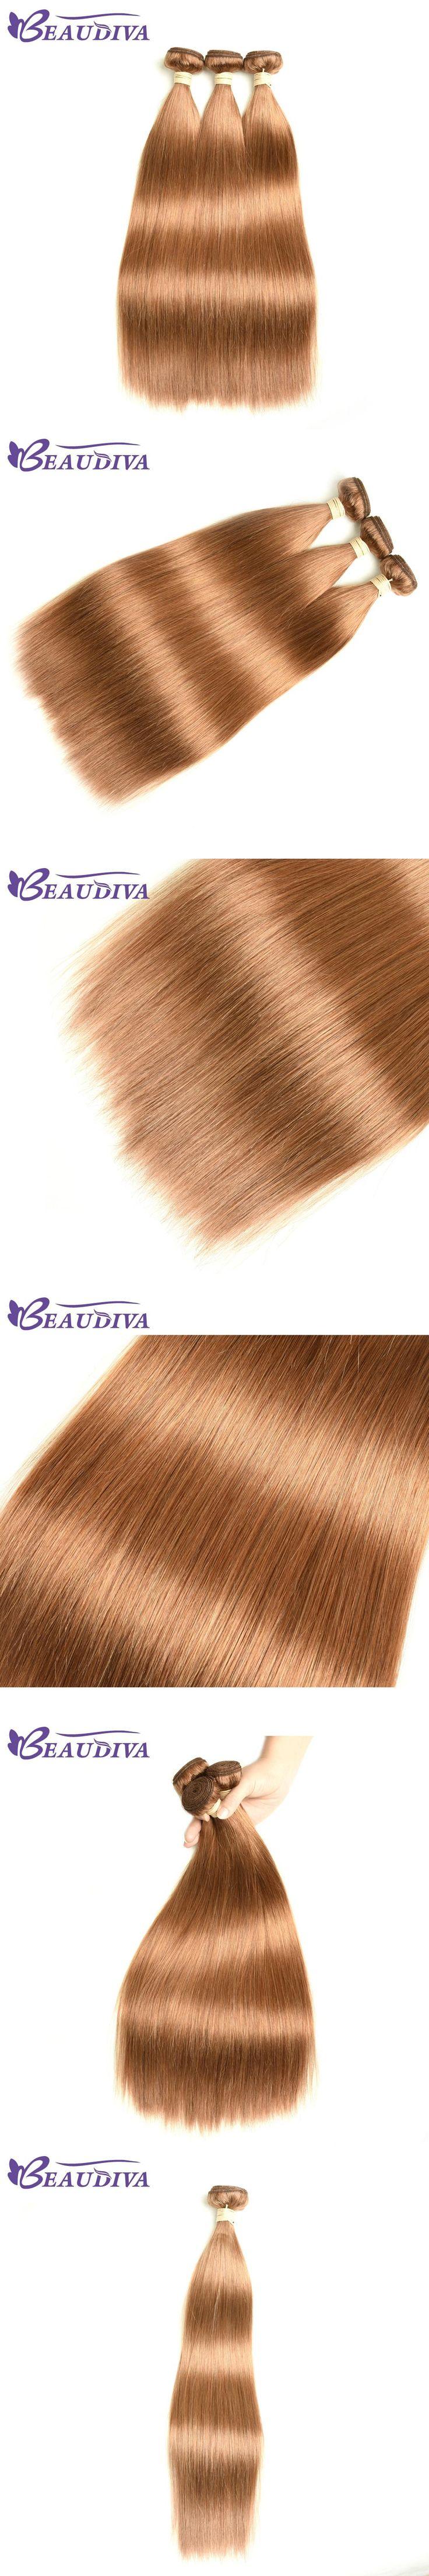 BEAUDIVA Pre-Colored Human Hair Weave 3PCS/LOT Straight #30 Light Brown Brazilian Hair Bundles Brazilian Remy Straight Hair